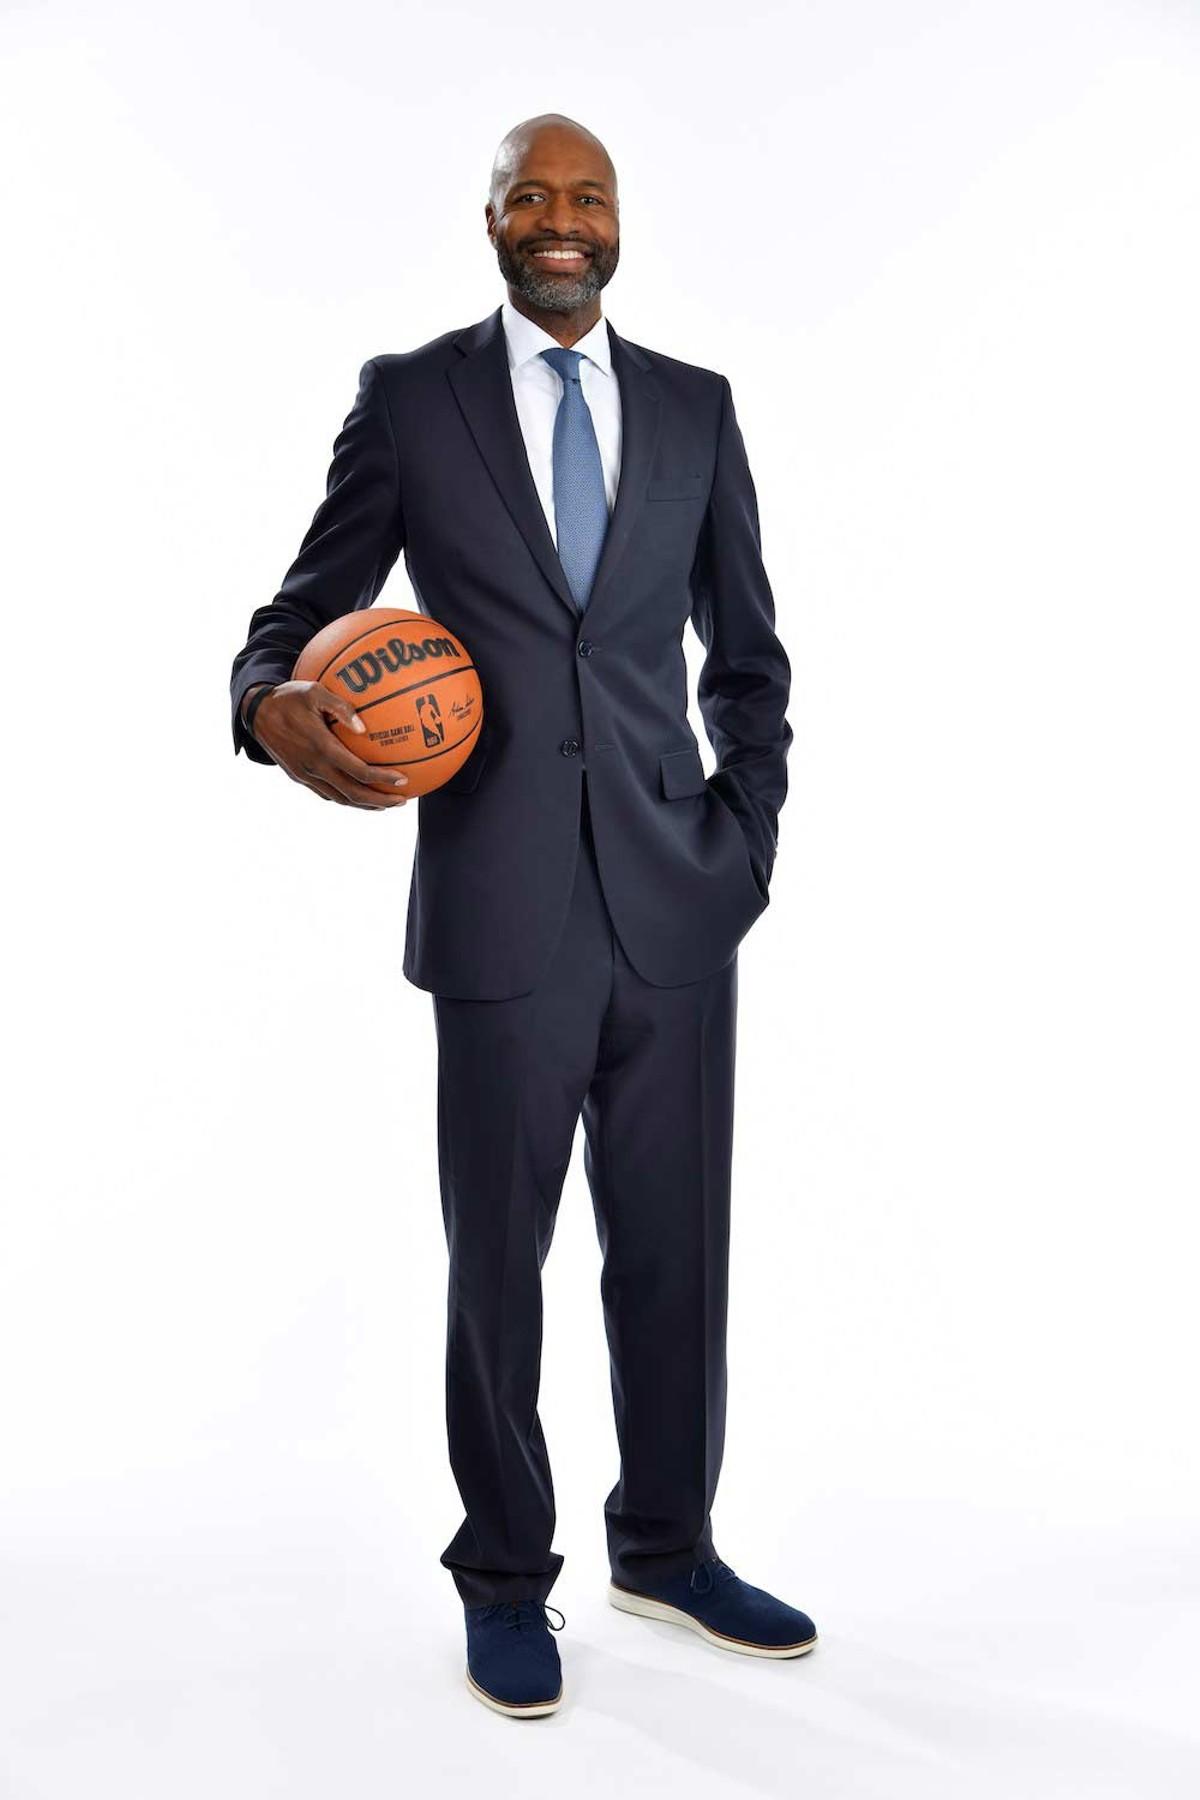 Coach Jamahl Mosley